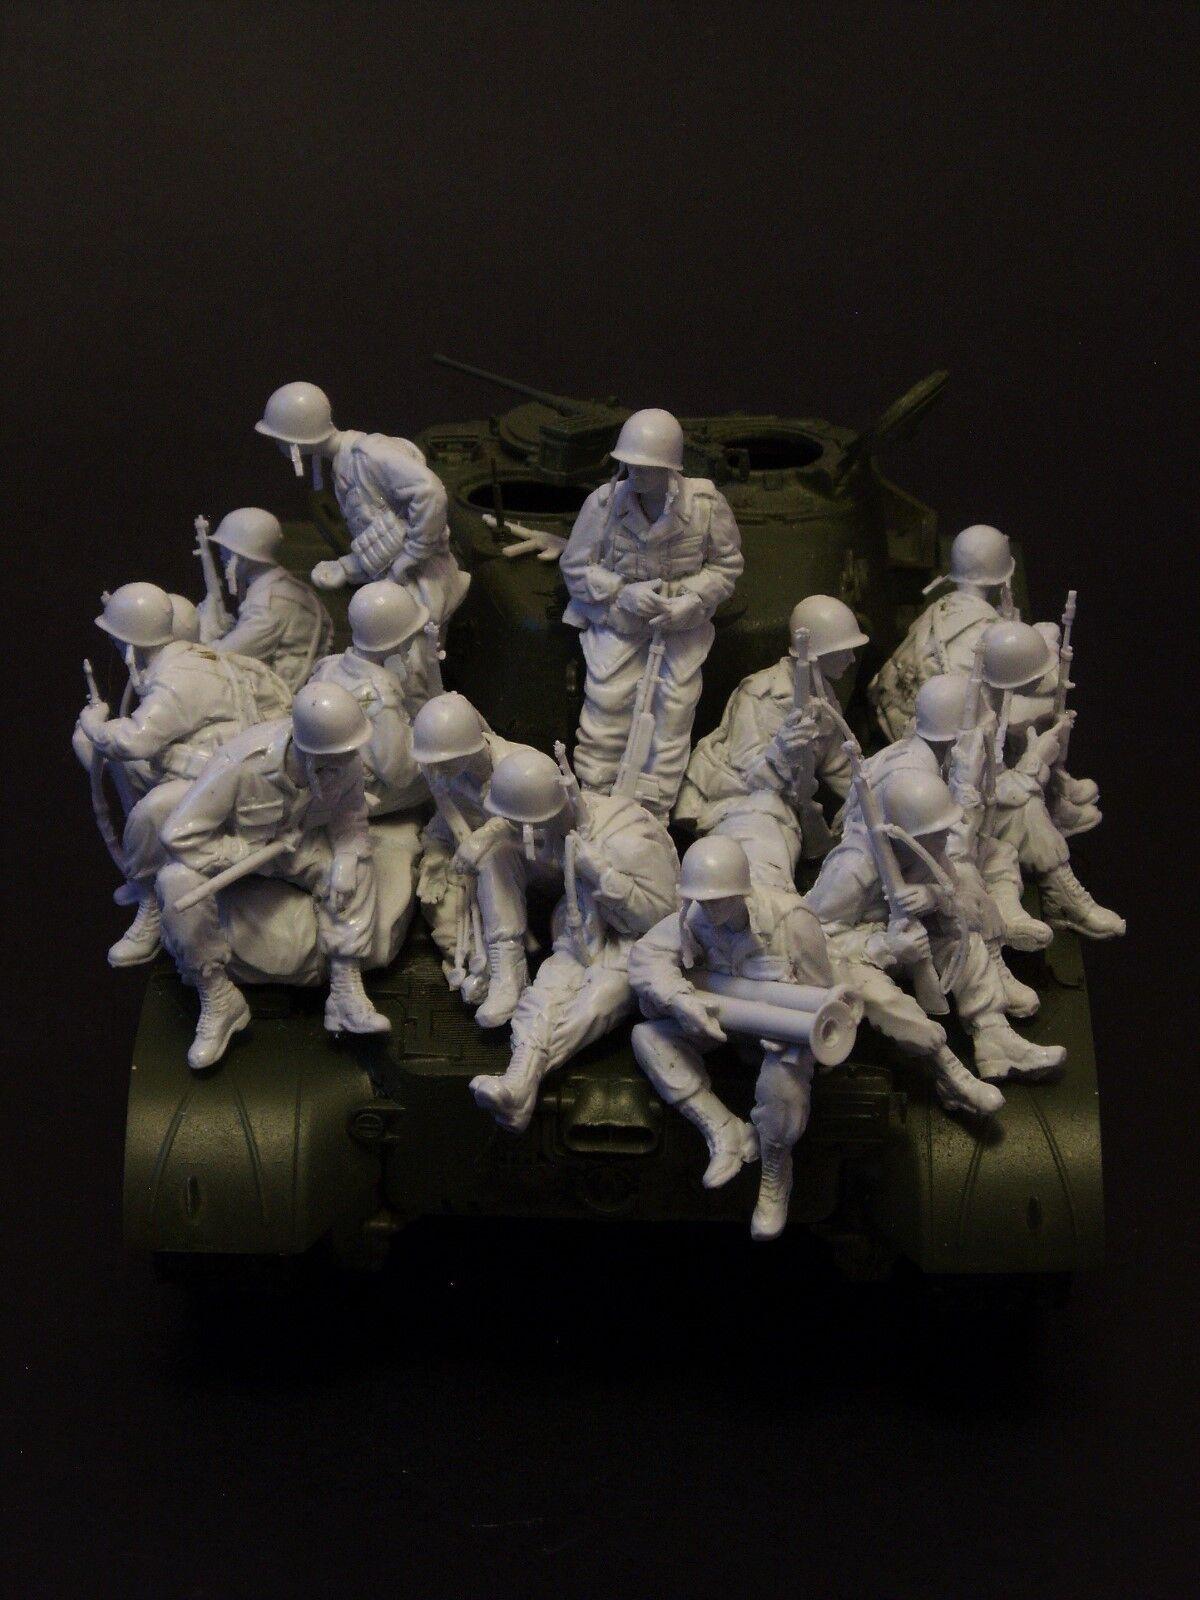 AC Models USArmy Pershing riders Korea 15 soldier figures 1 35th Unpaintd kit